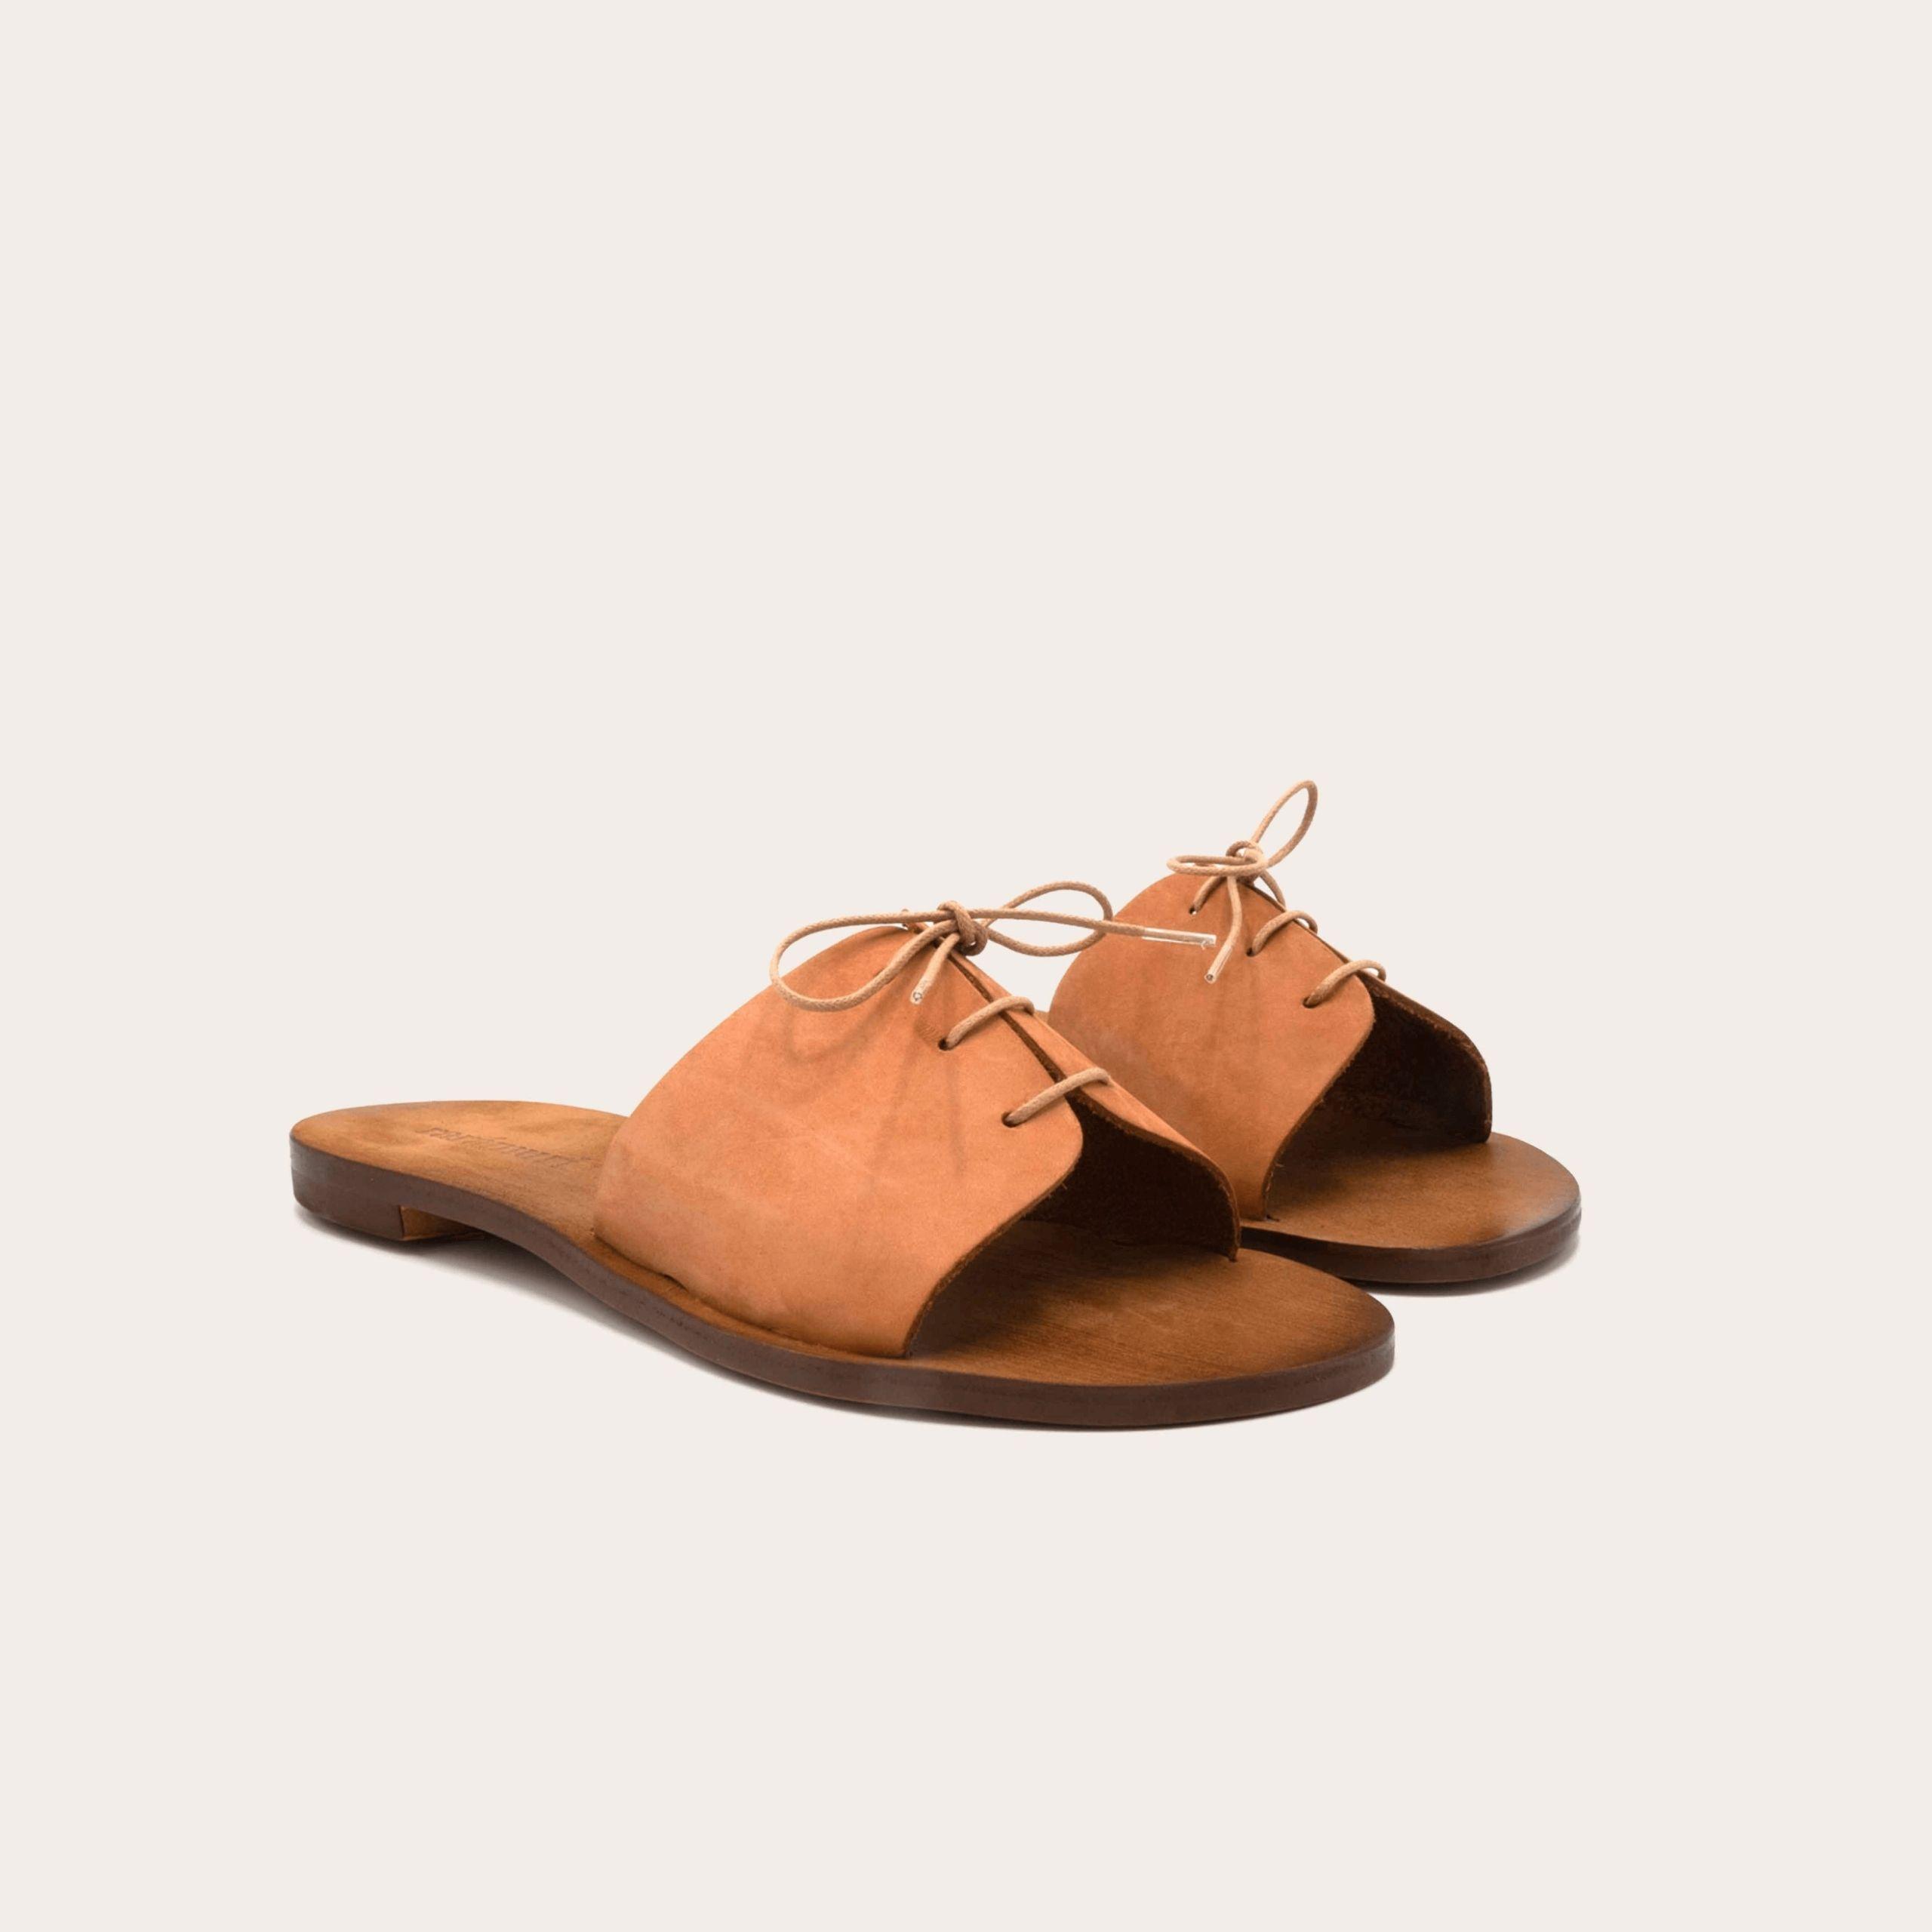 cali-rose_2_lintsandalen sandals travelsandals vegan sustainable sandals wikkelsandalen